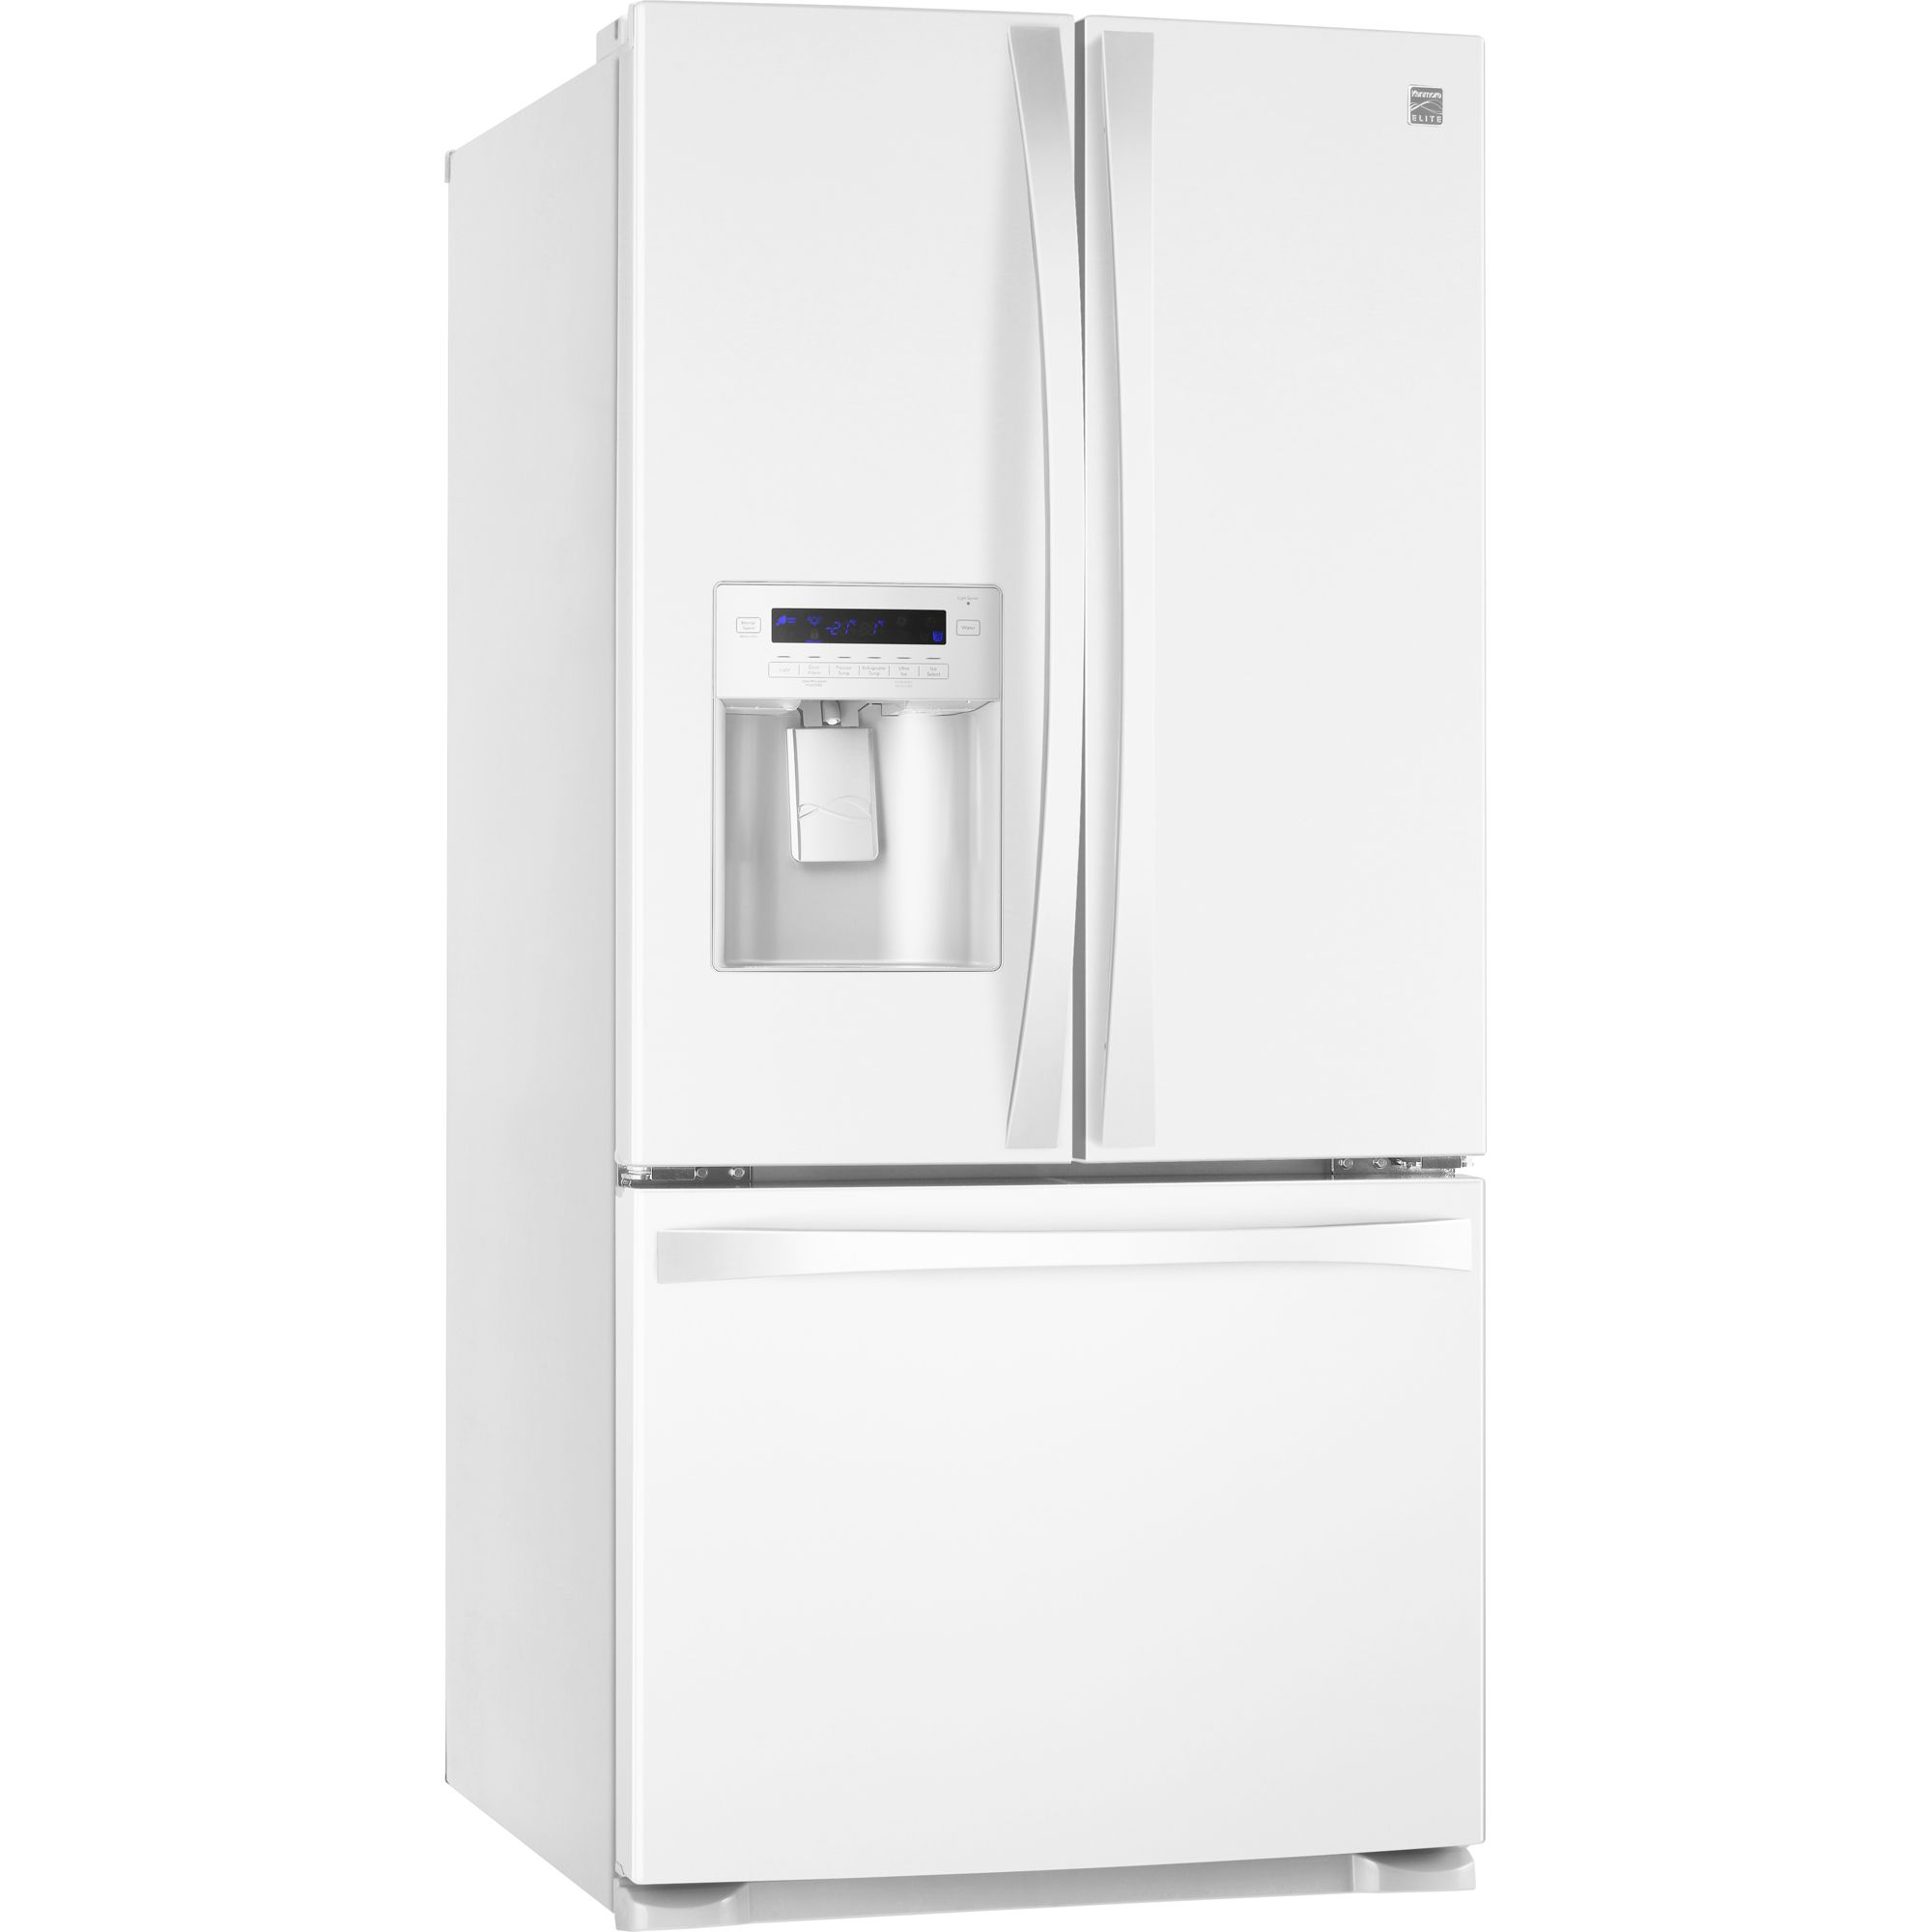 Kenmore Elite 25.0 cu. ft. French-Door Bottom-Freezer Refrigerator - White